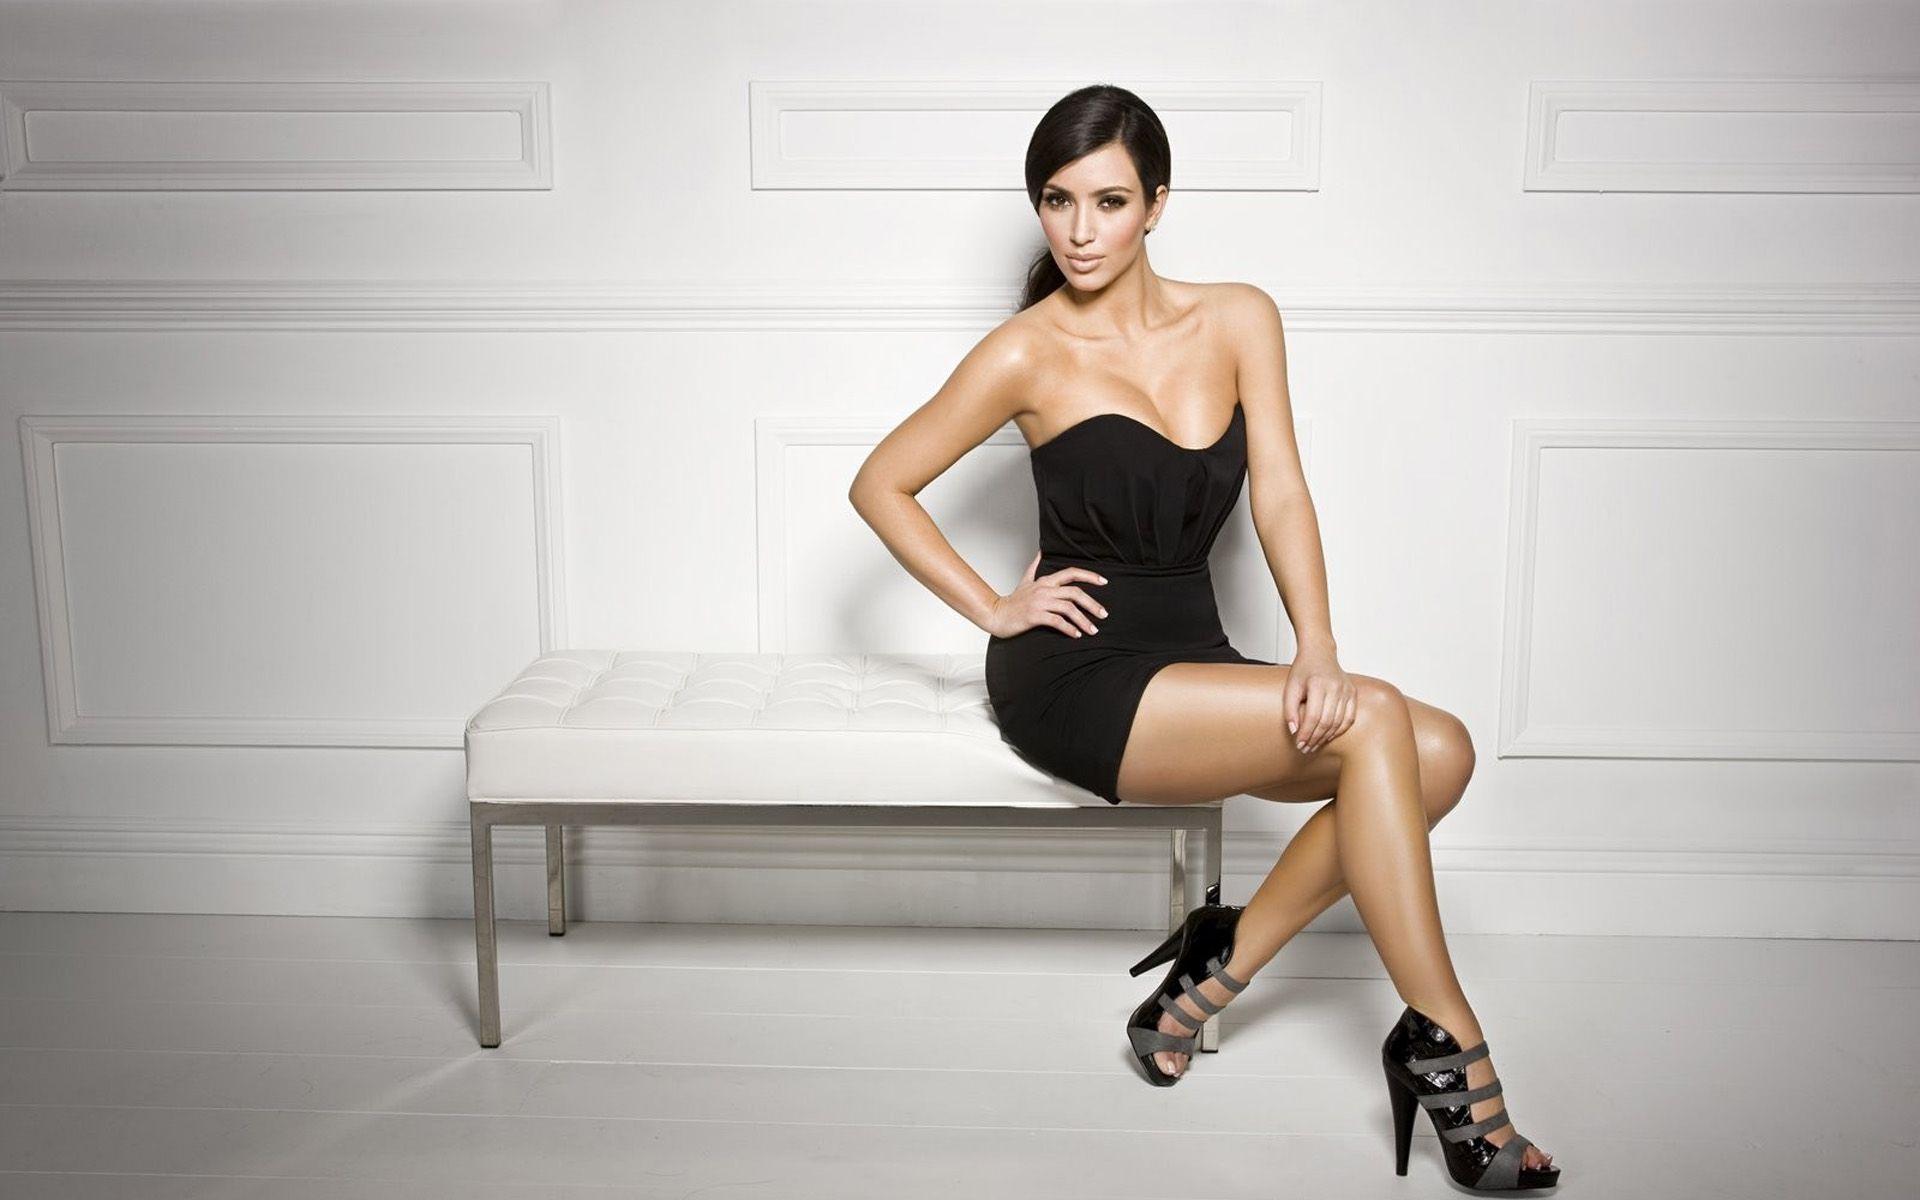 Kim-Kardashian-Pictures-Photos-Screensavers-1920×1080-Kim-Kardashian-Picture-Wallpape-wallpaper-wp3407806